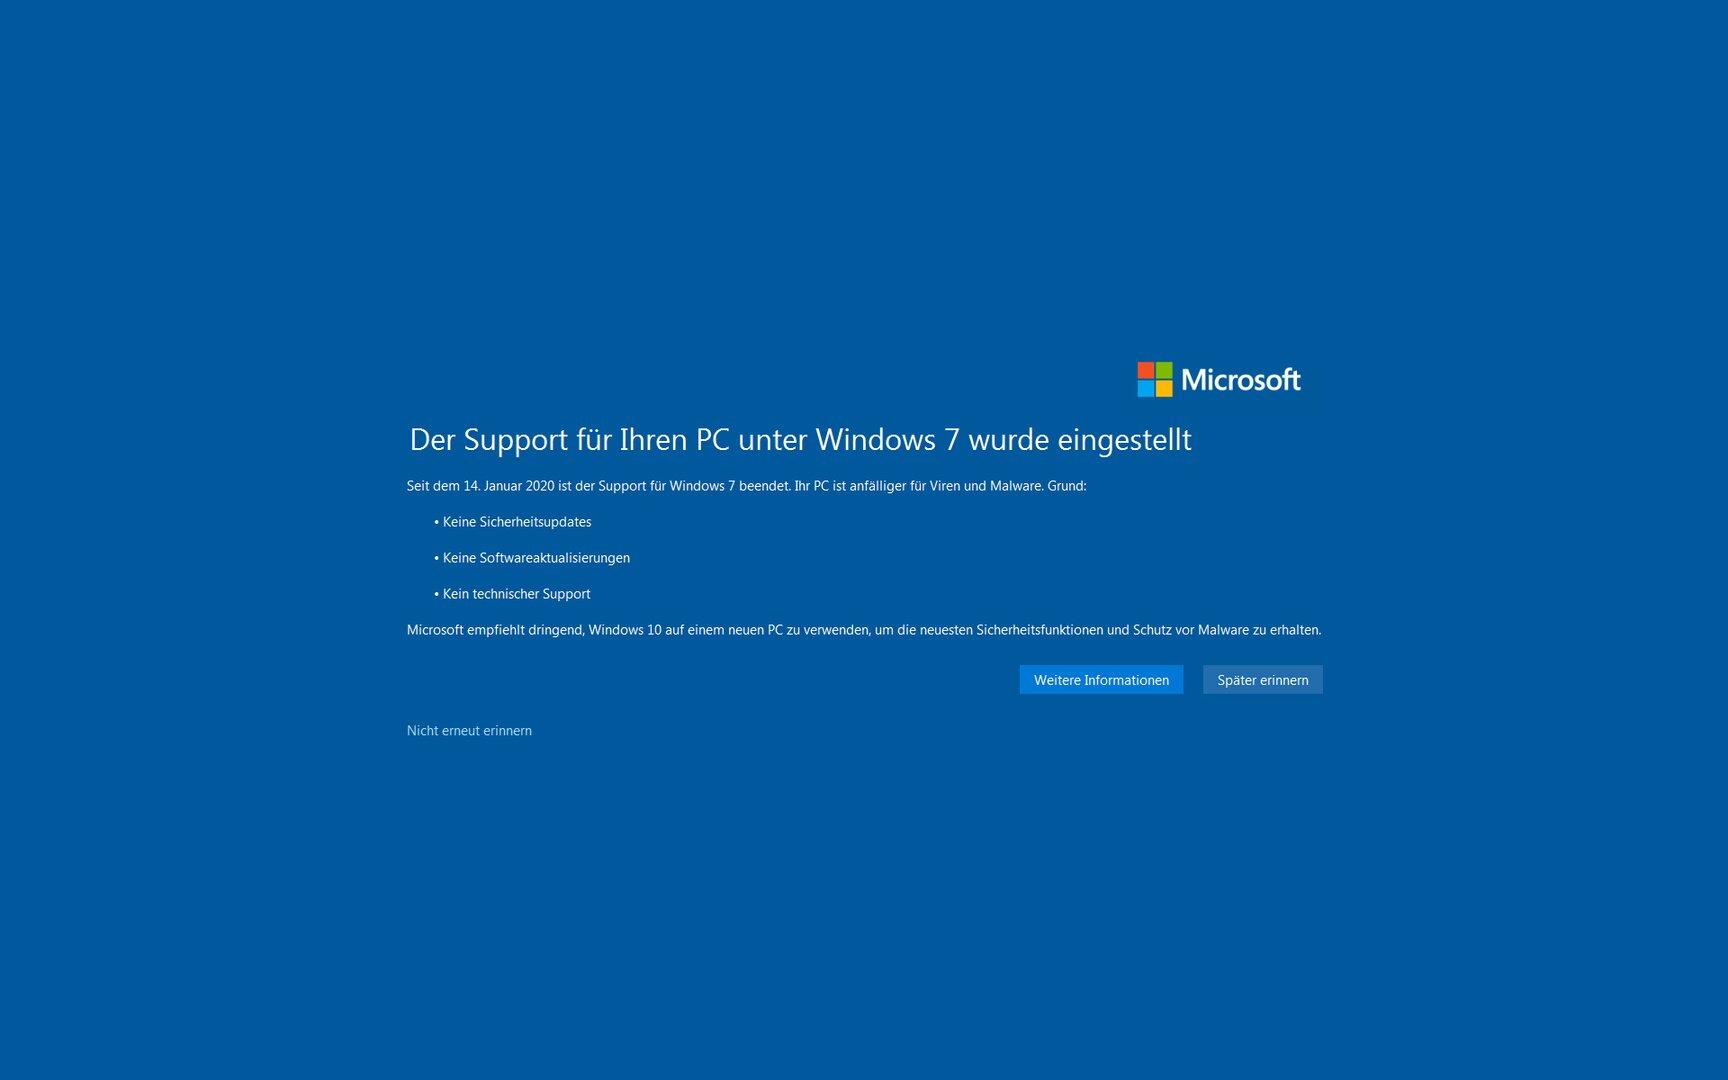 Ab dem 15. Januar 2020 warnt Windows 7 vor sich selber